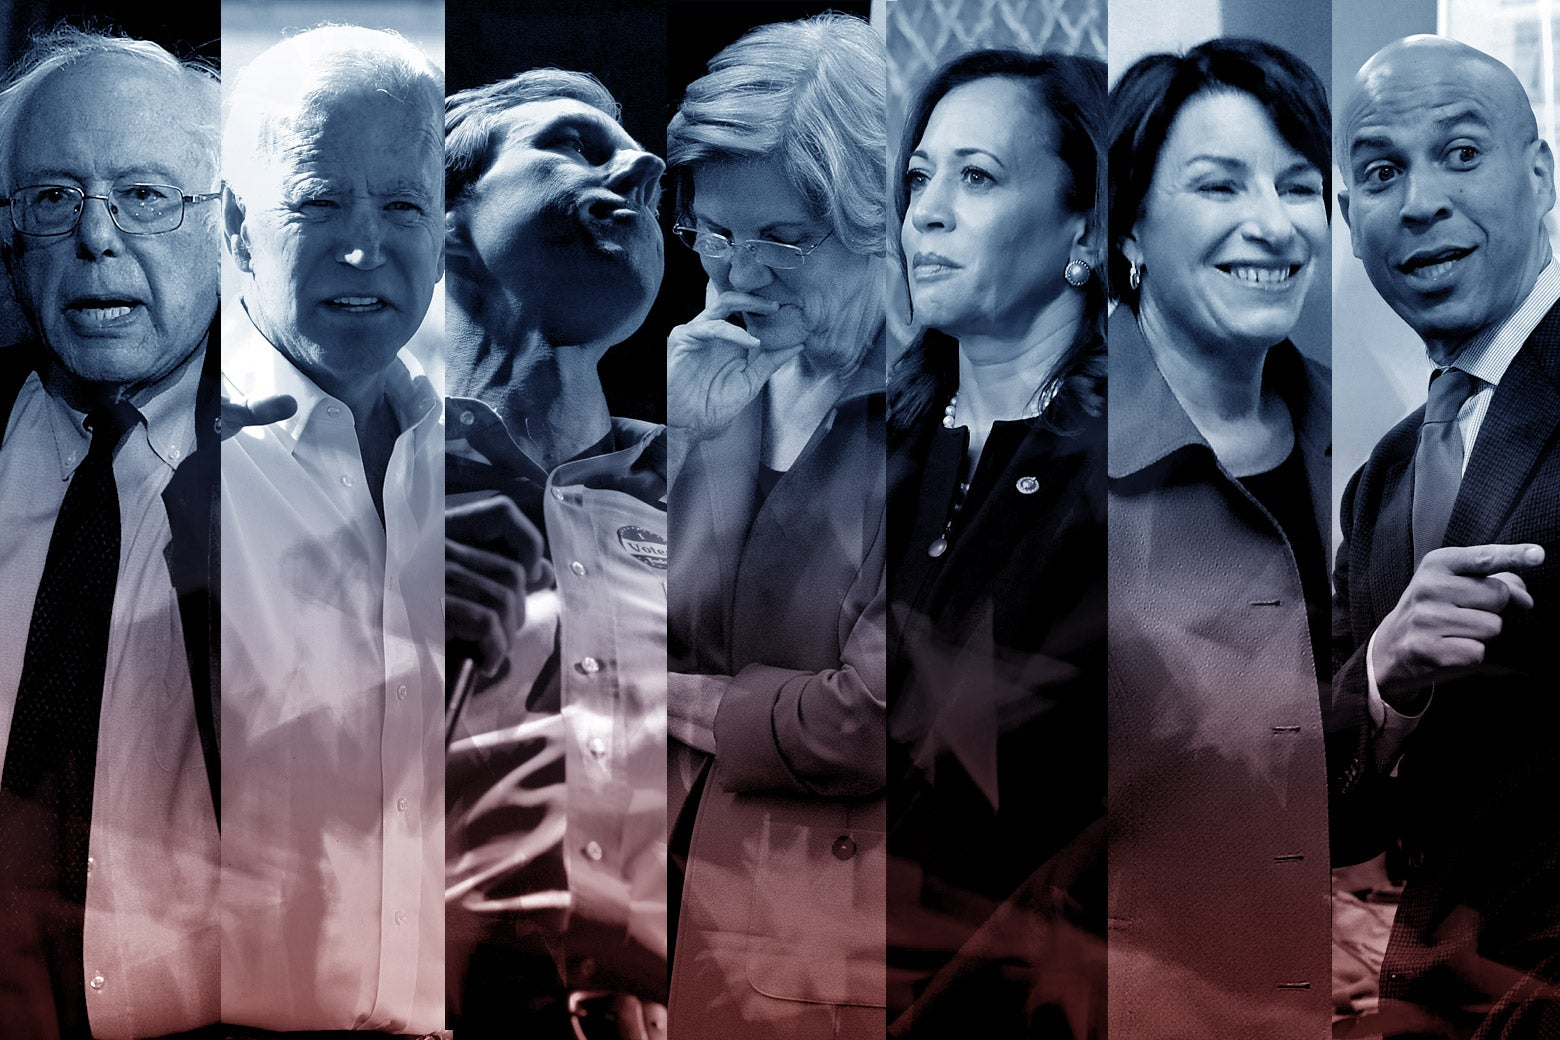 Bernie Sanders, Joe Biden, Beto O'Rourke, Elizabeth Warren, Kamala Harris, Amy Klobuchar, and Cory Booker.